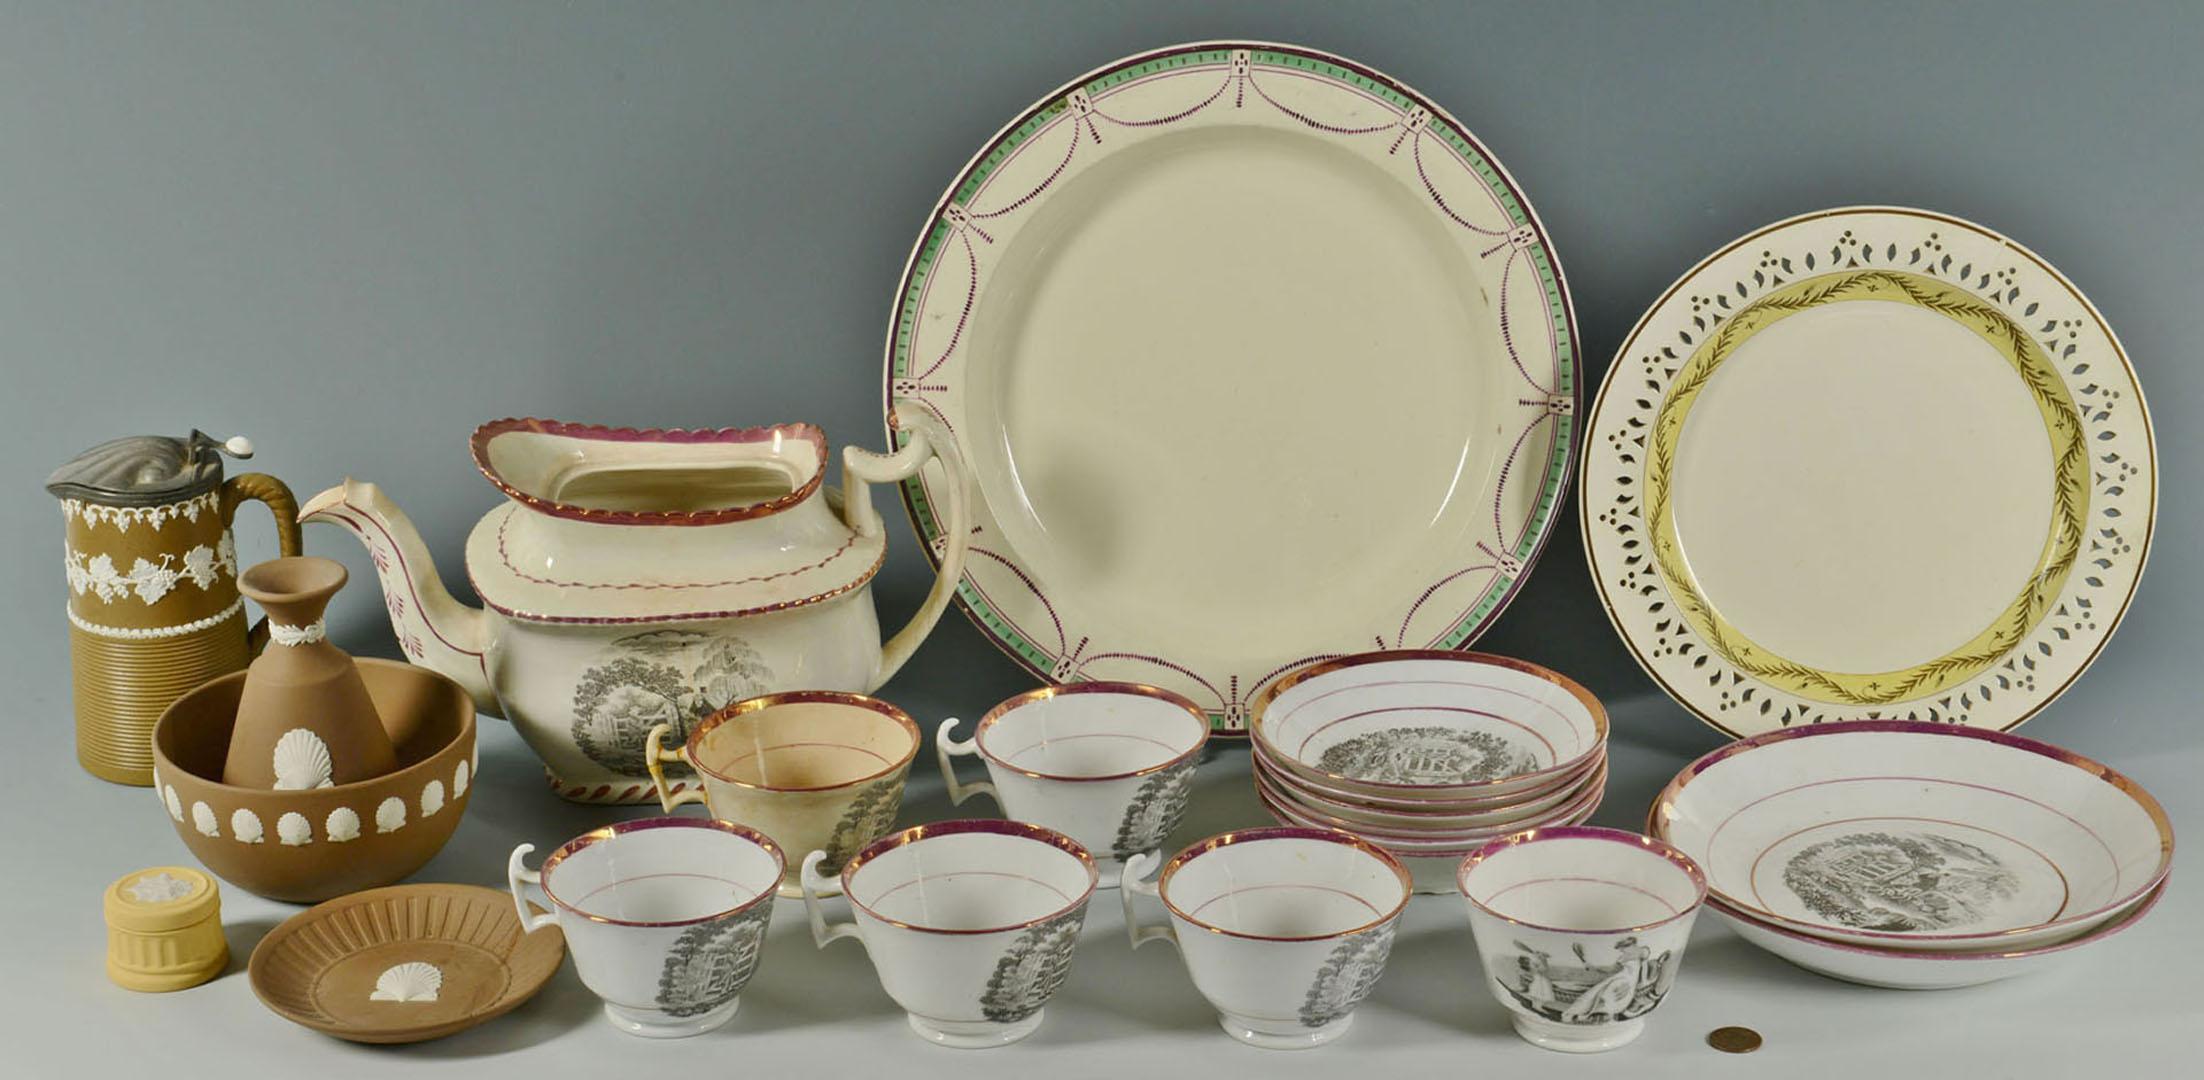 Engleska keramika  - Page 4 2872336_1